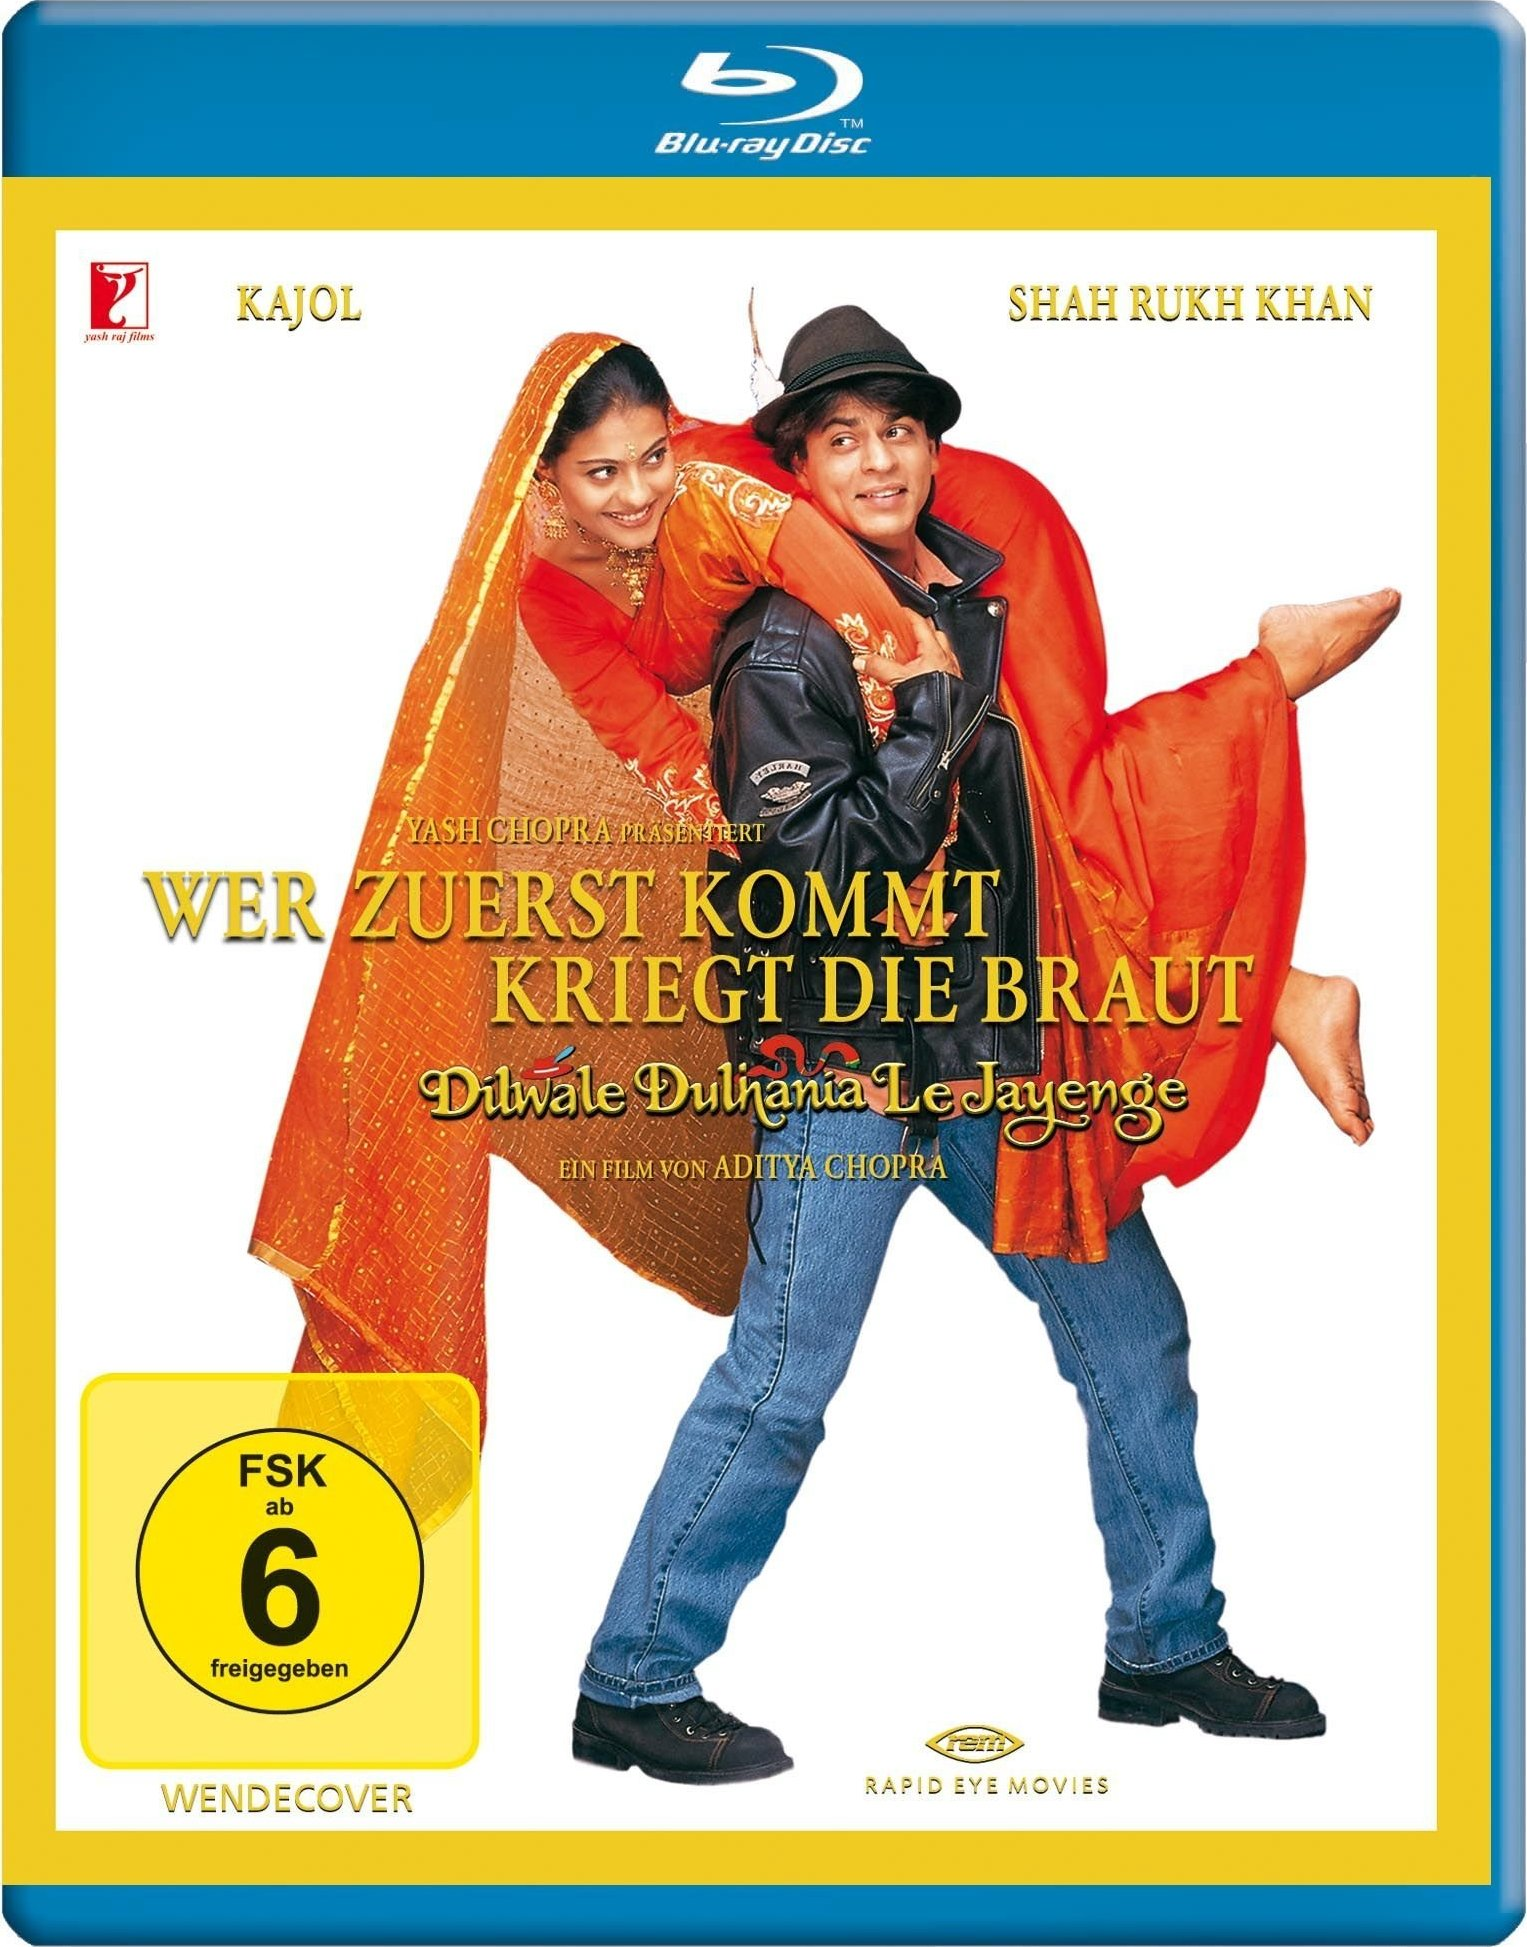 Ddlj Full Movie Download Hd 720p Fasrshowcase